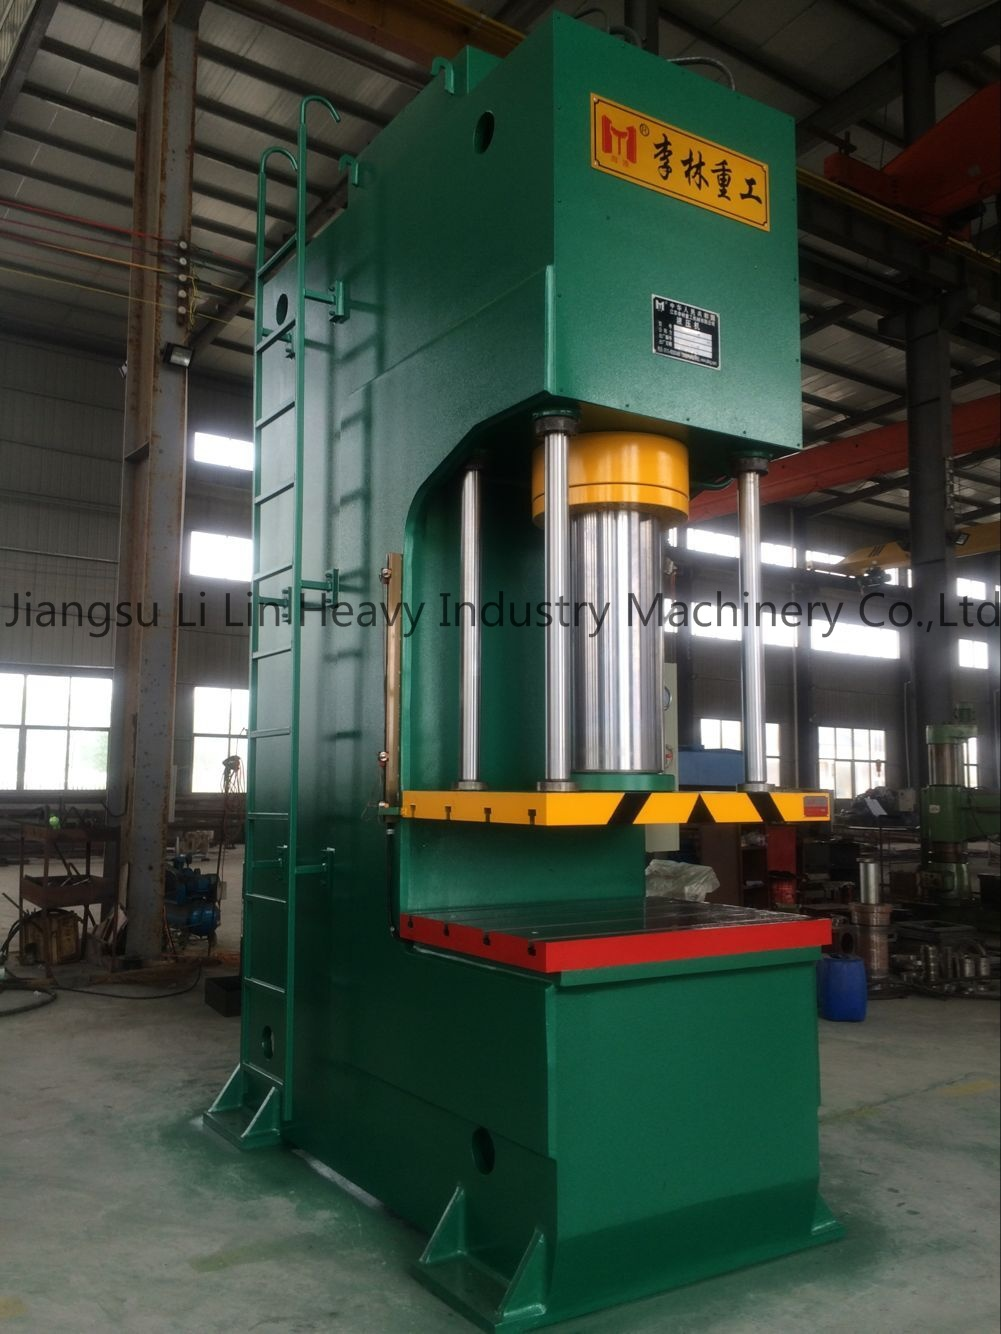 Single Column Hydraulic Press (straightening and mounting) Yll30-315